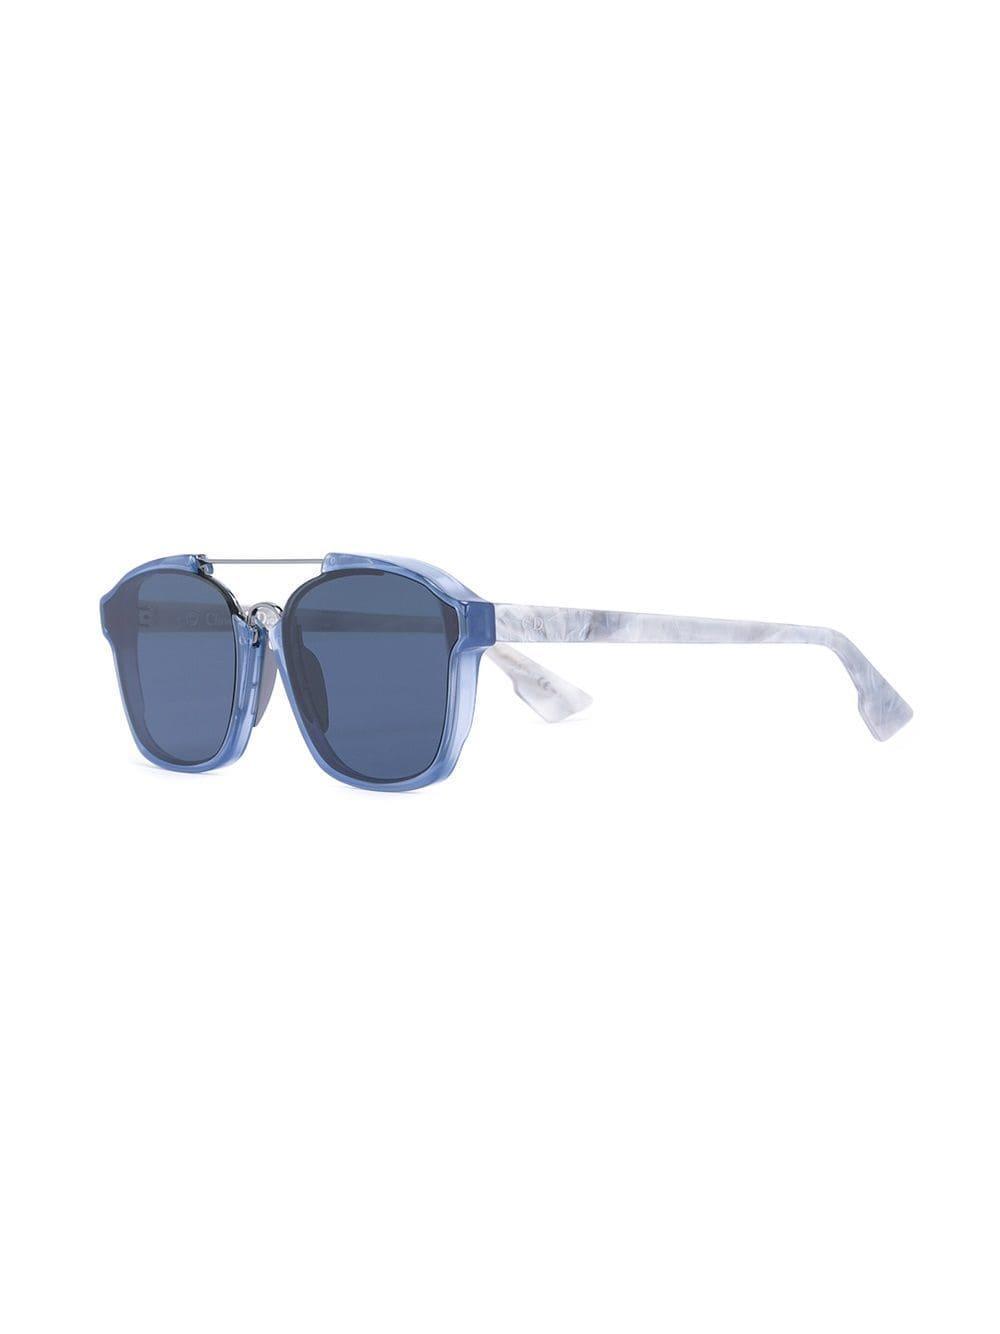 58b3455eb1 Dior eyewear gafas de sol abstract - azul